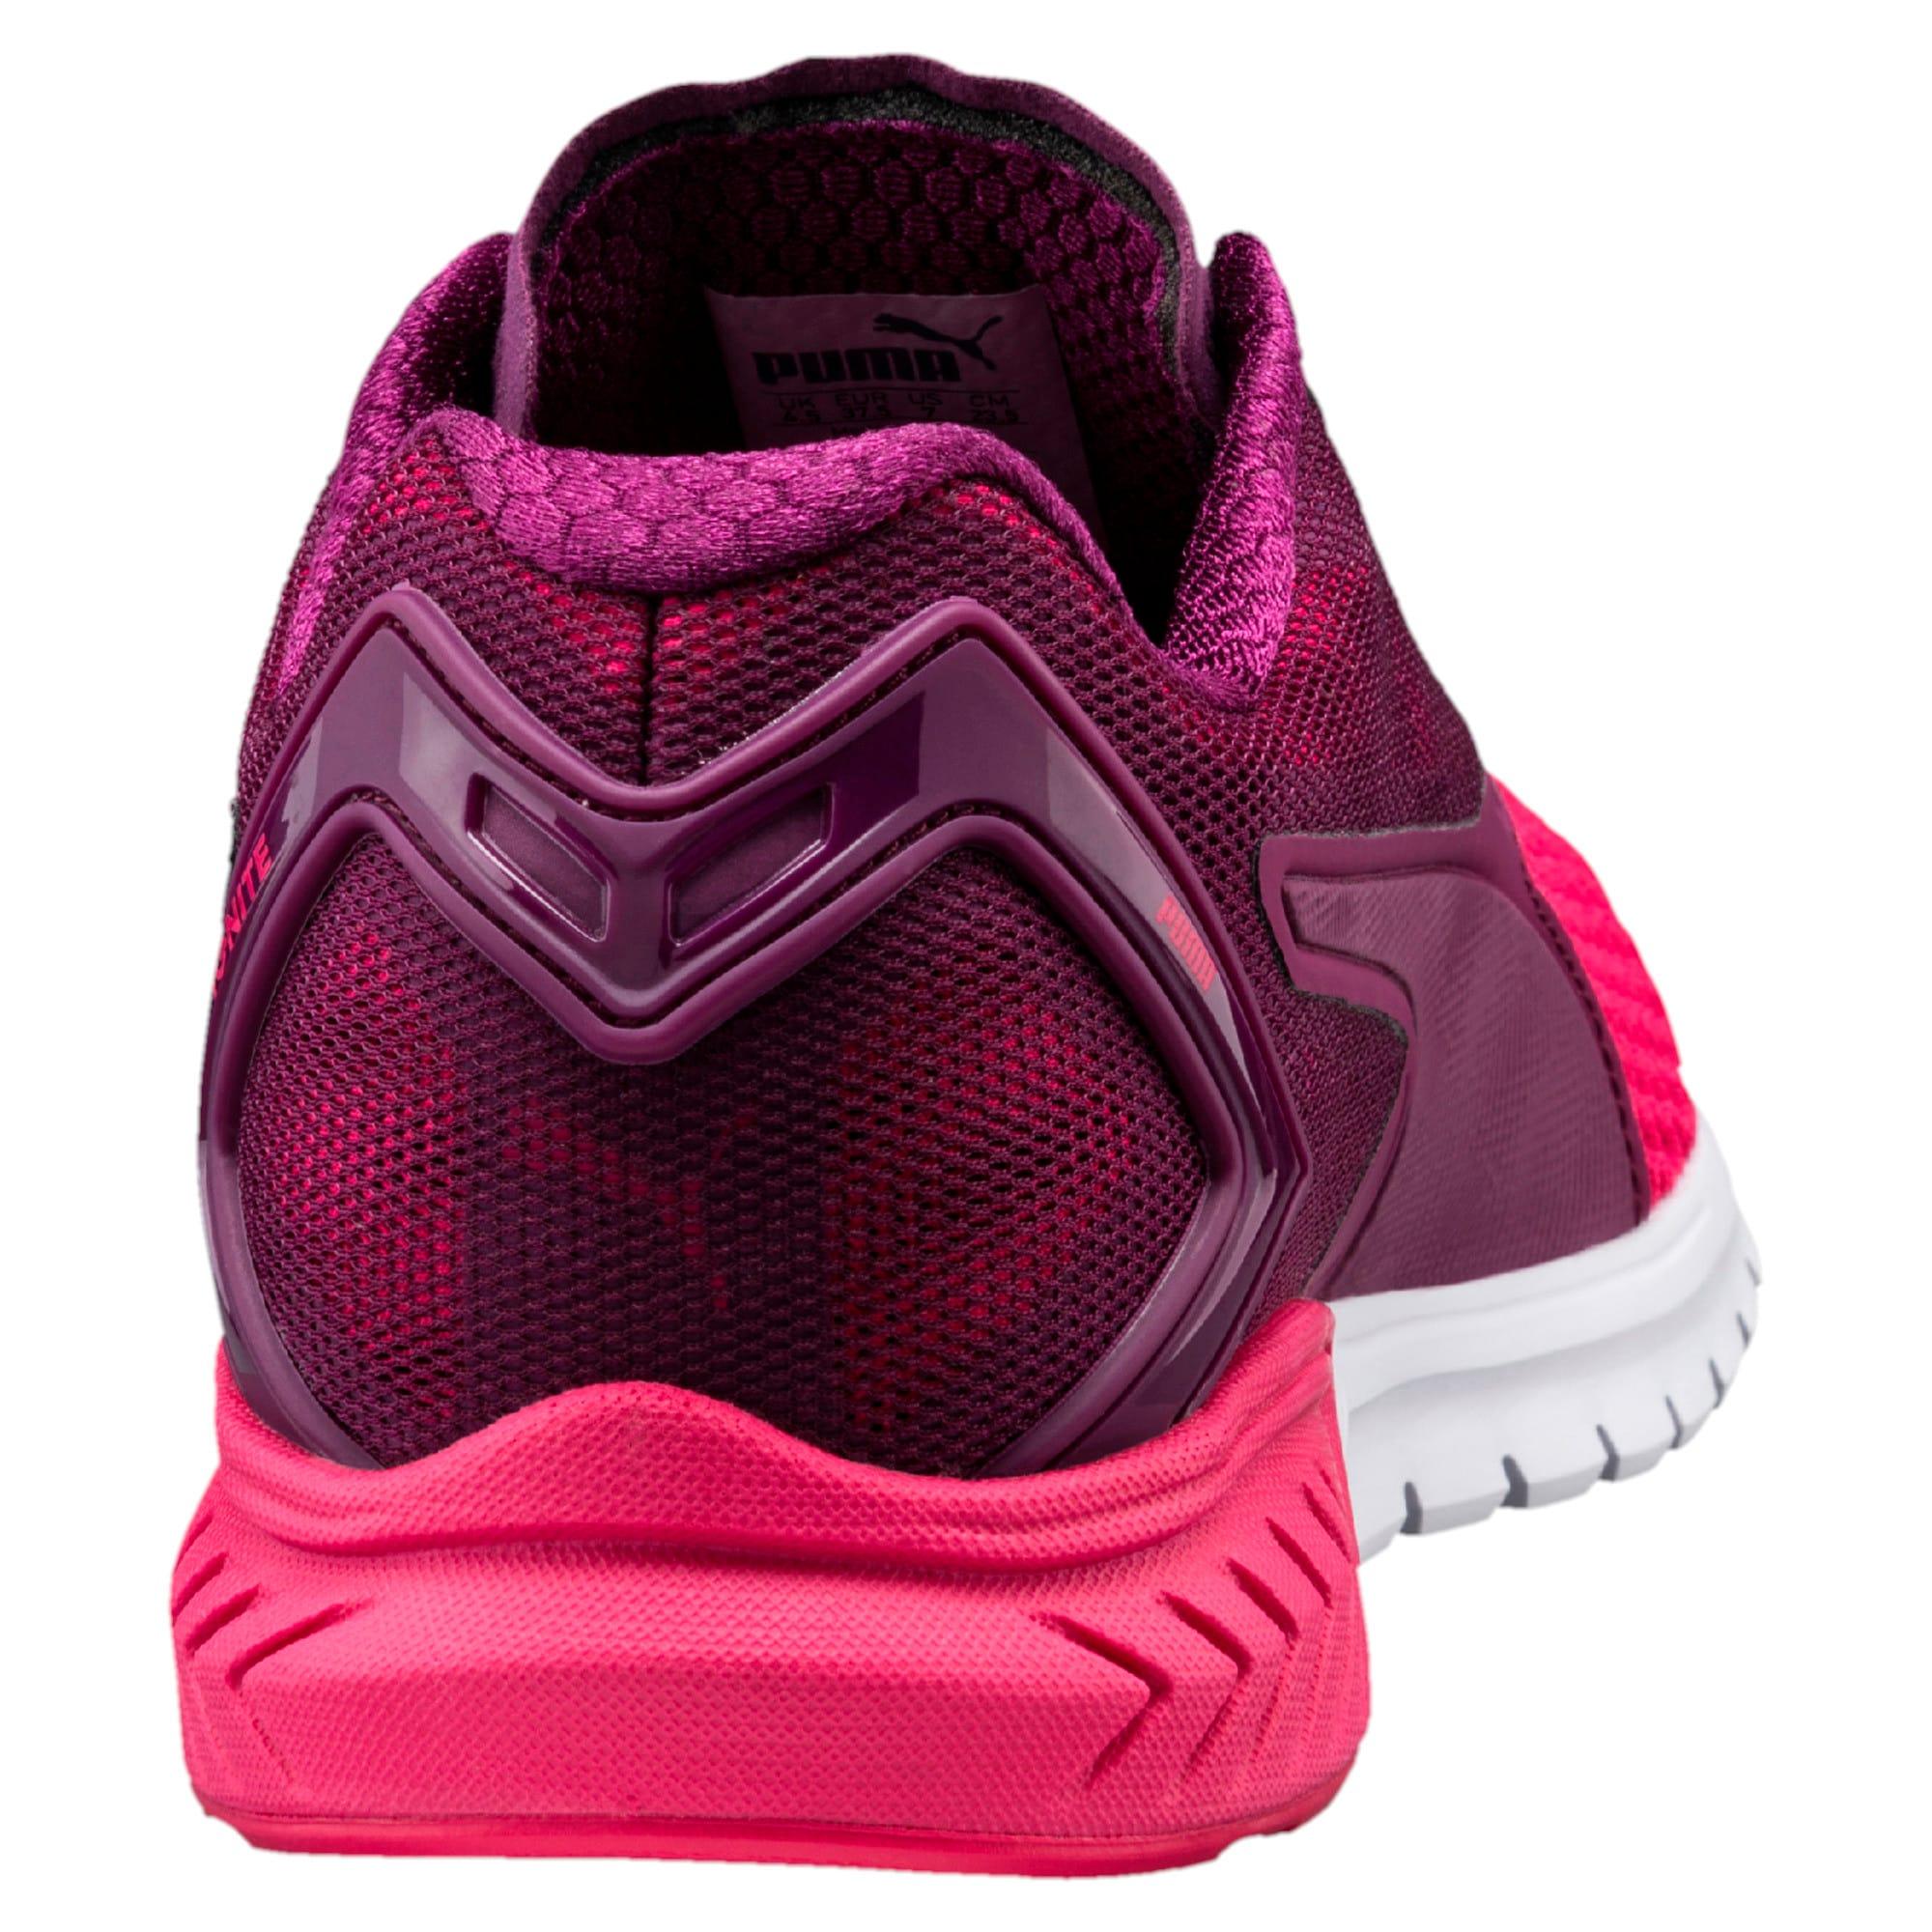 Thumbnail 3 of IGNITE Dual Mesh Women's Running Shoes, Dark Purple-Love Potion, medium-IND